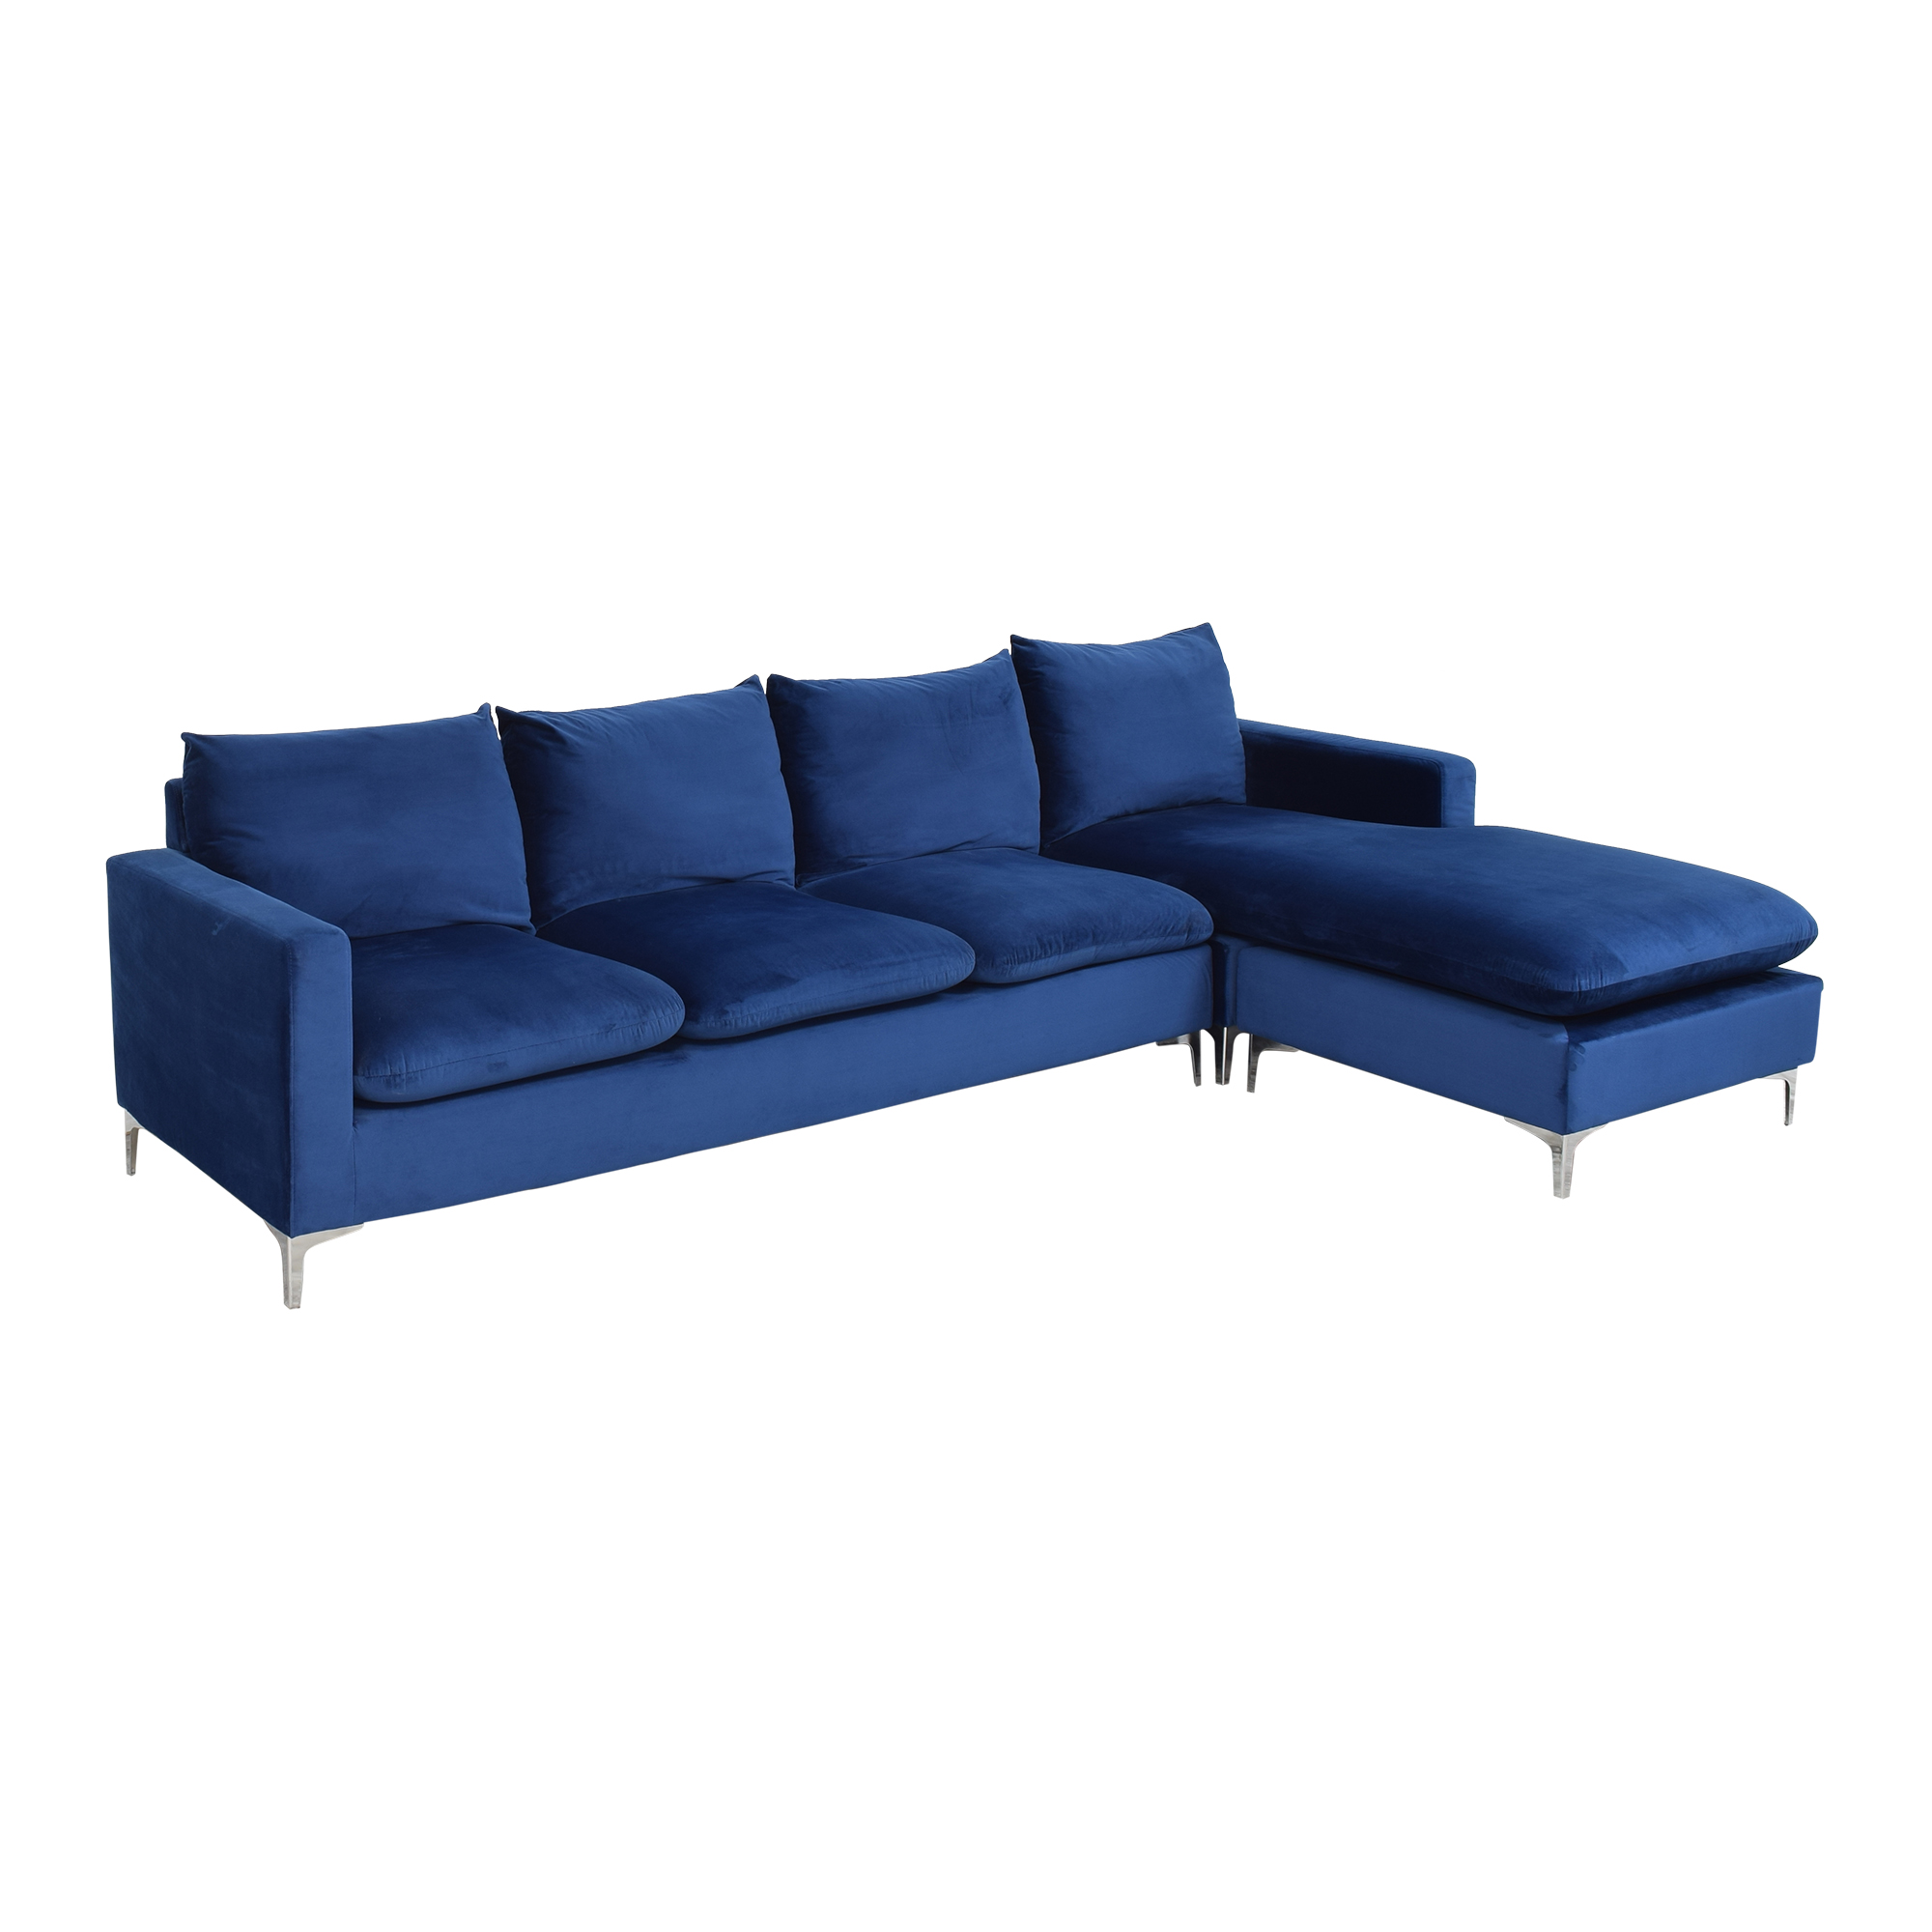 Wayfair Wayfair Boutwell Reversible Sectional Sofa for sale